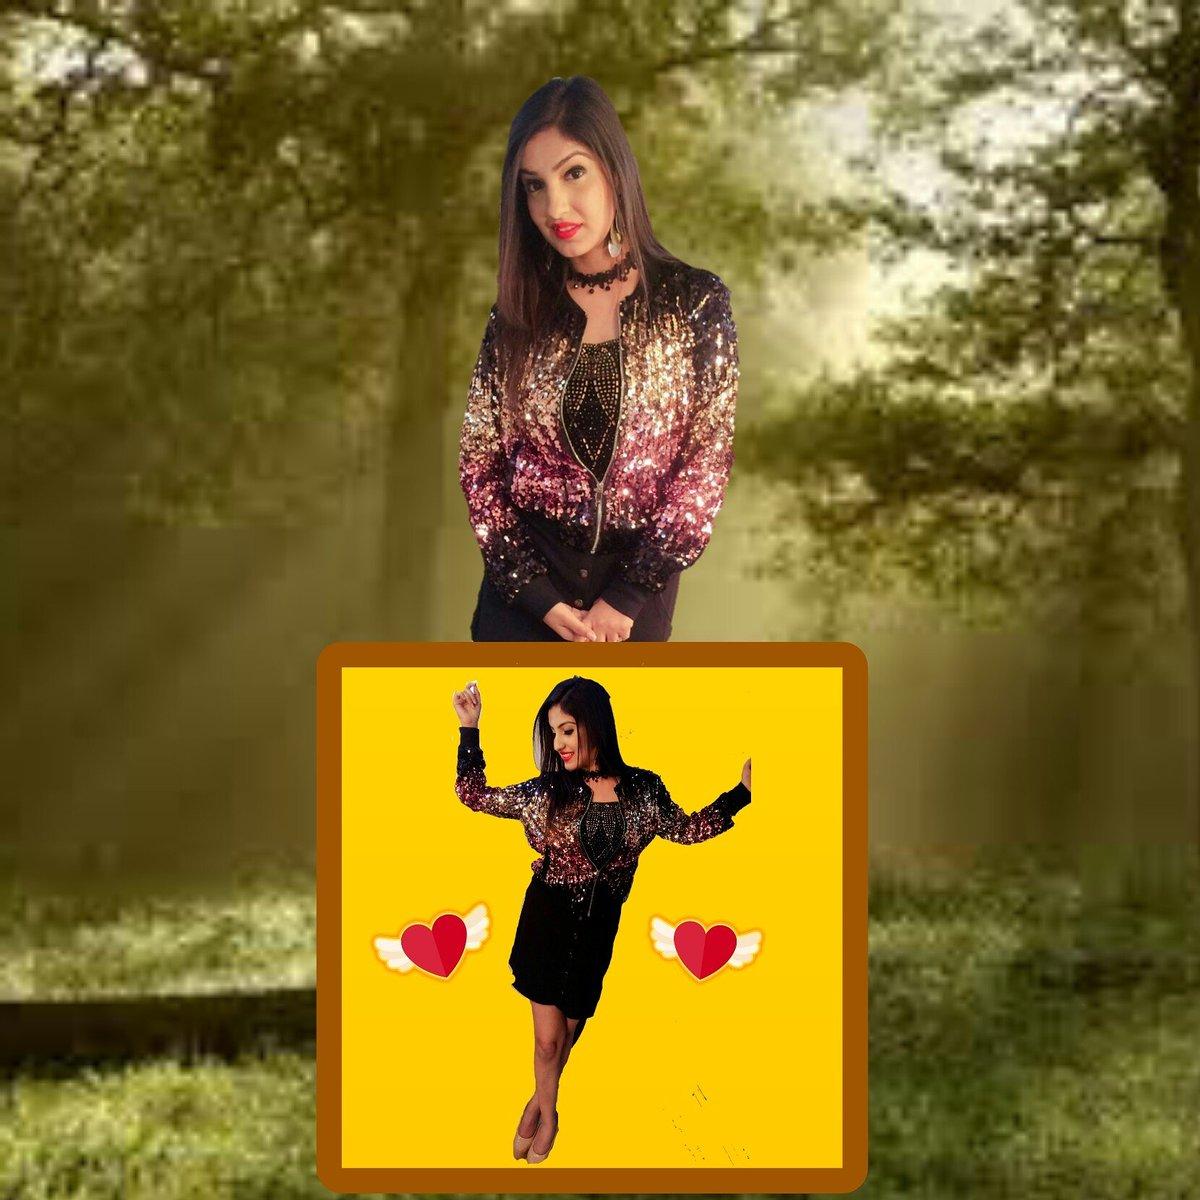 Good morning beautiful @RupaliJagga #RJ @zeetalent_in<br>http://pic.twitter.com/aSyocICssn